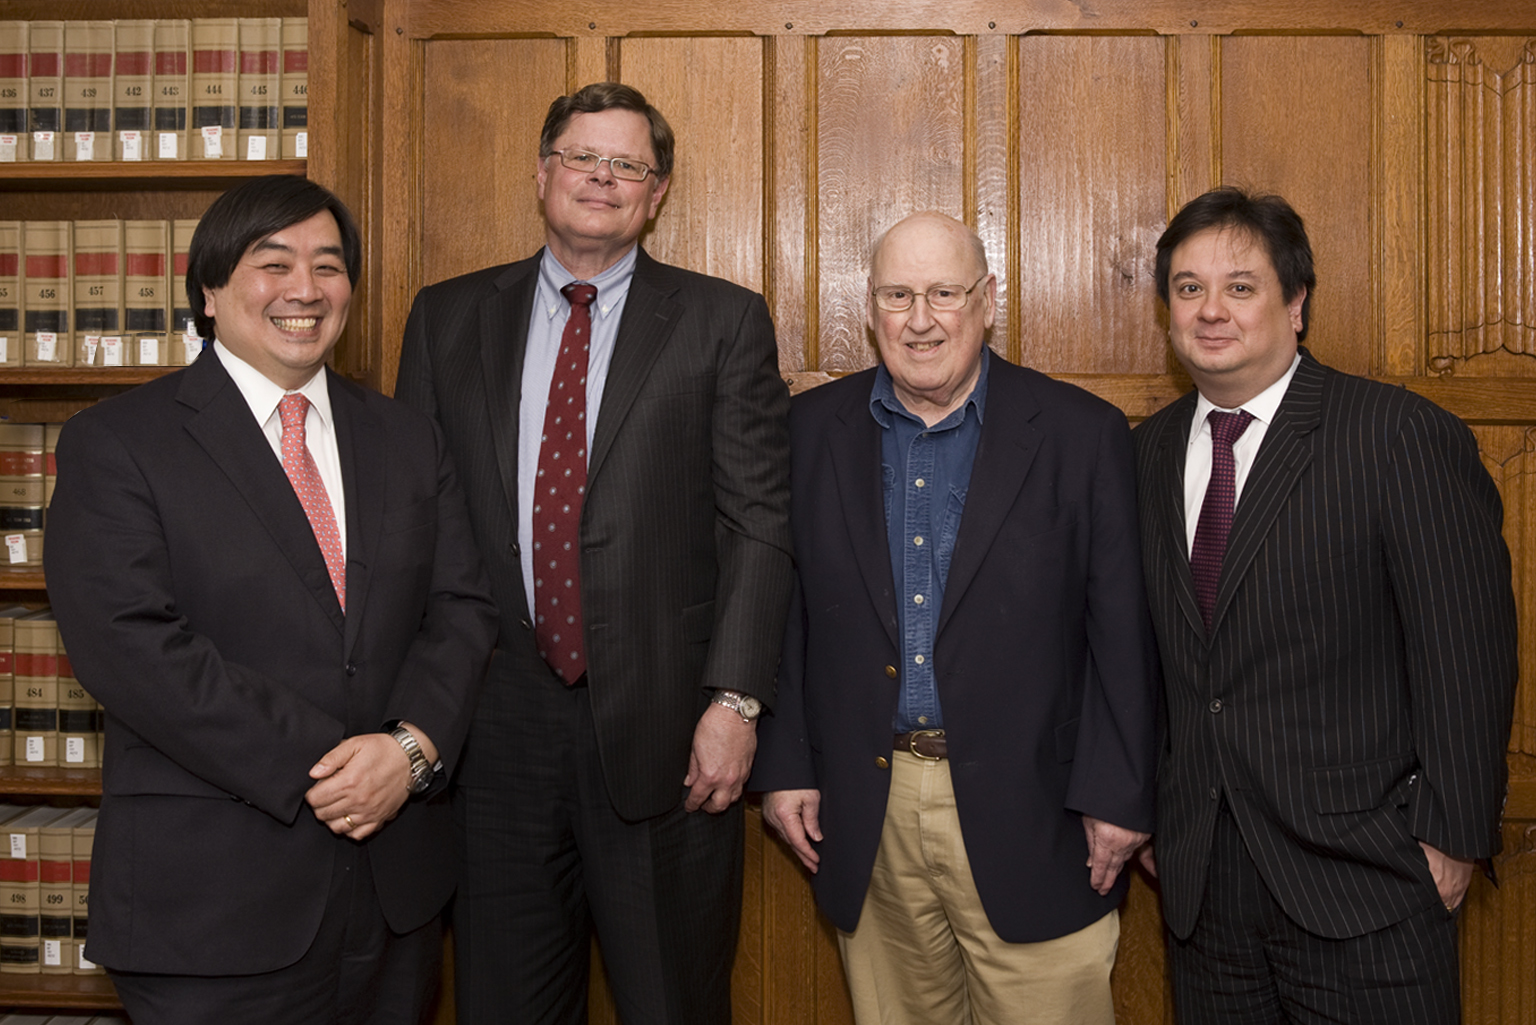 YLS Dean Harold Koh, Harvard Law Prof. Reinier Kraakman '79, Judge Ralph Winter '60, and George Conway '87